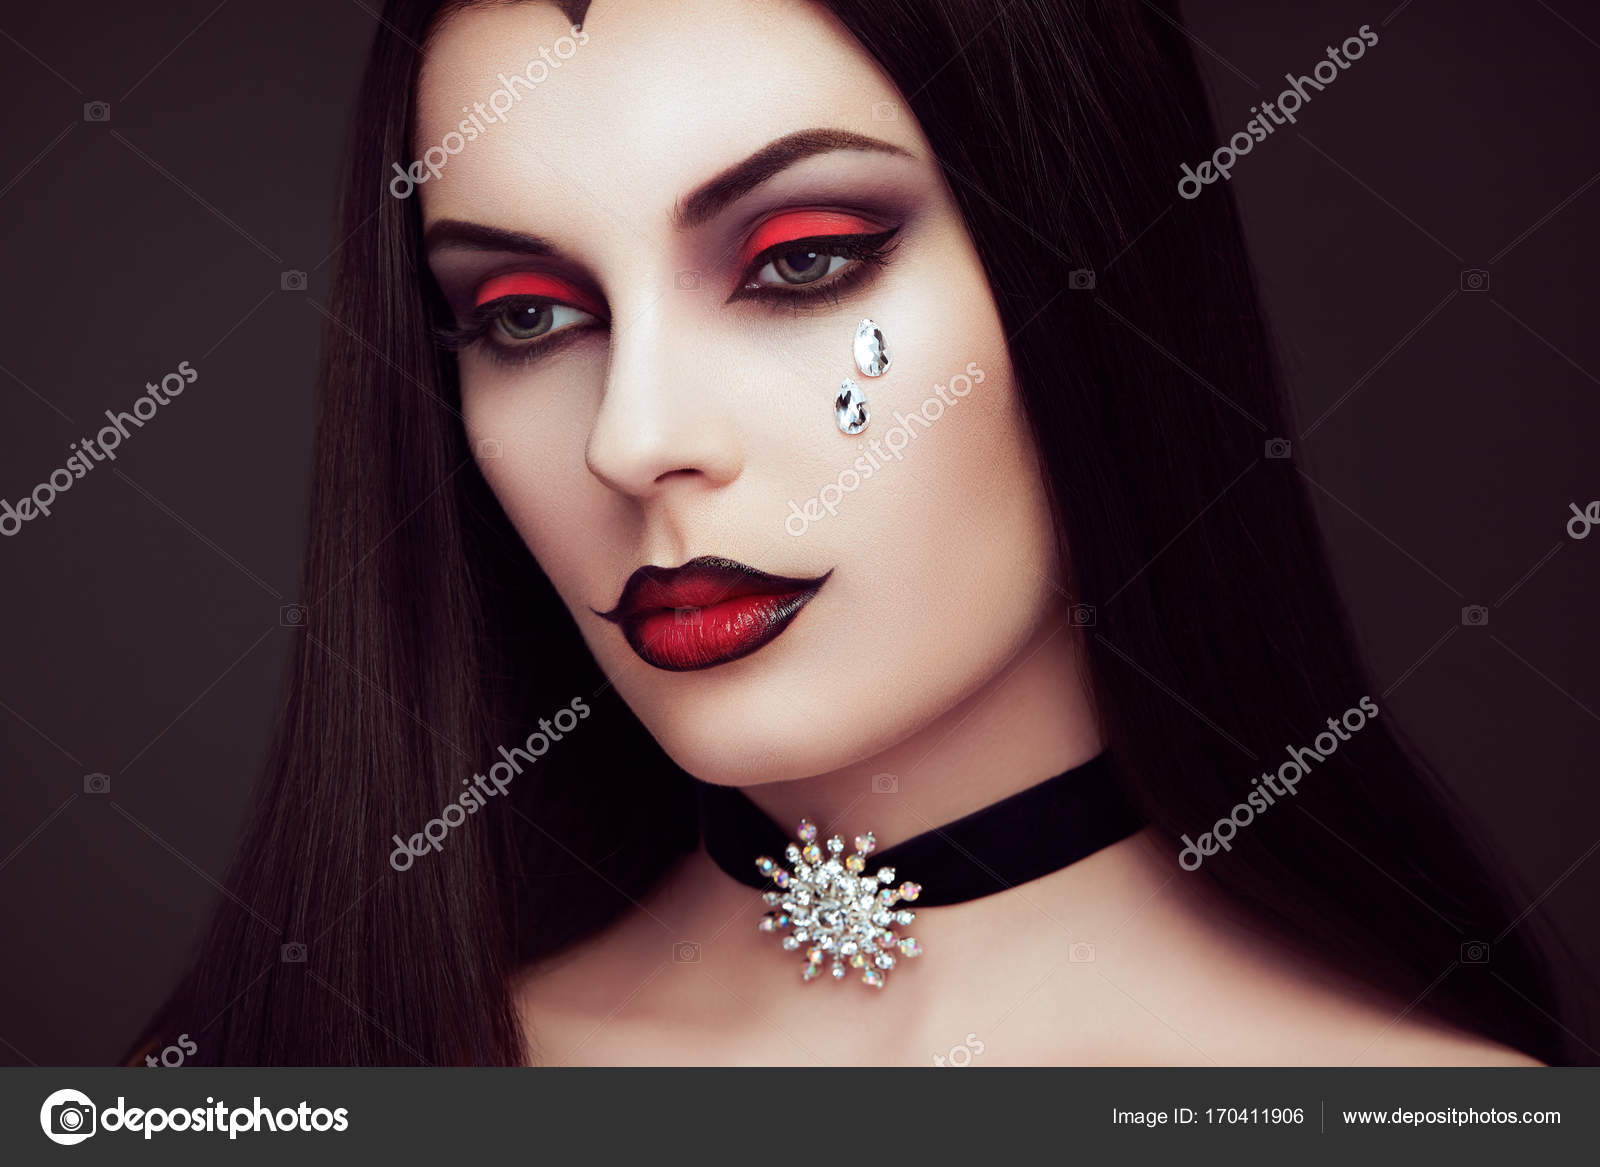 portrait de femme vampire halloween photographie. Black Bedroom Furniture Sets. Home Design Ideas